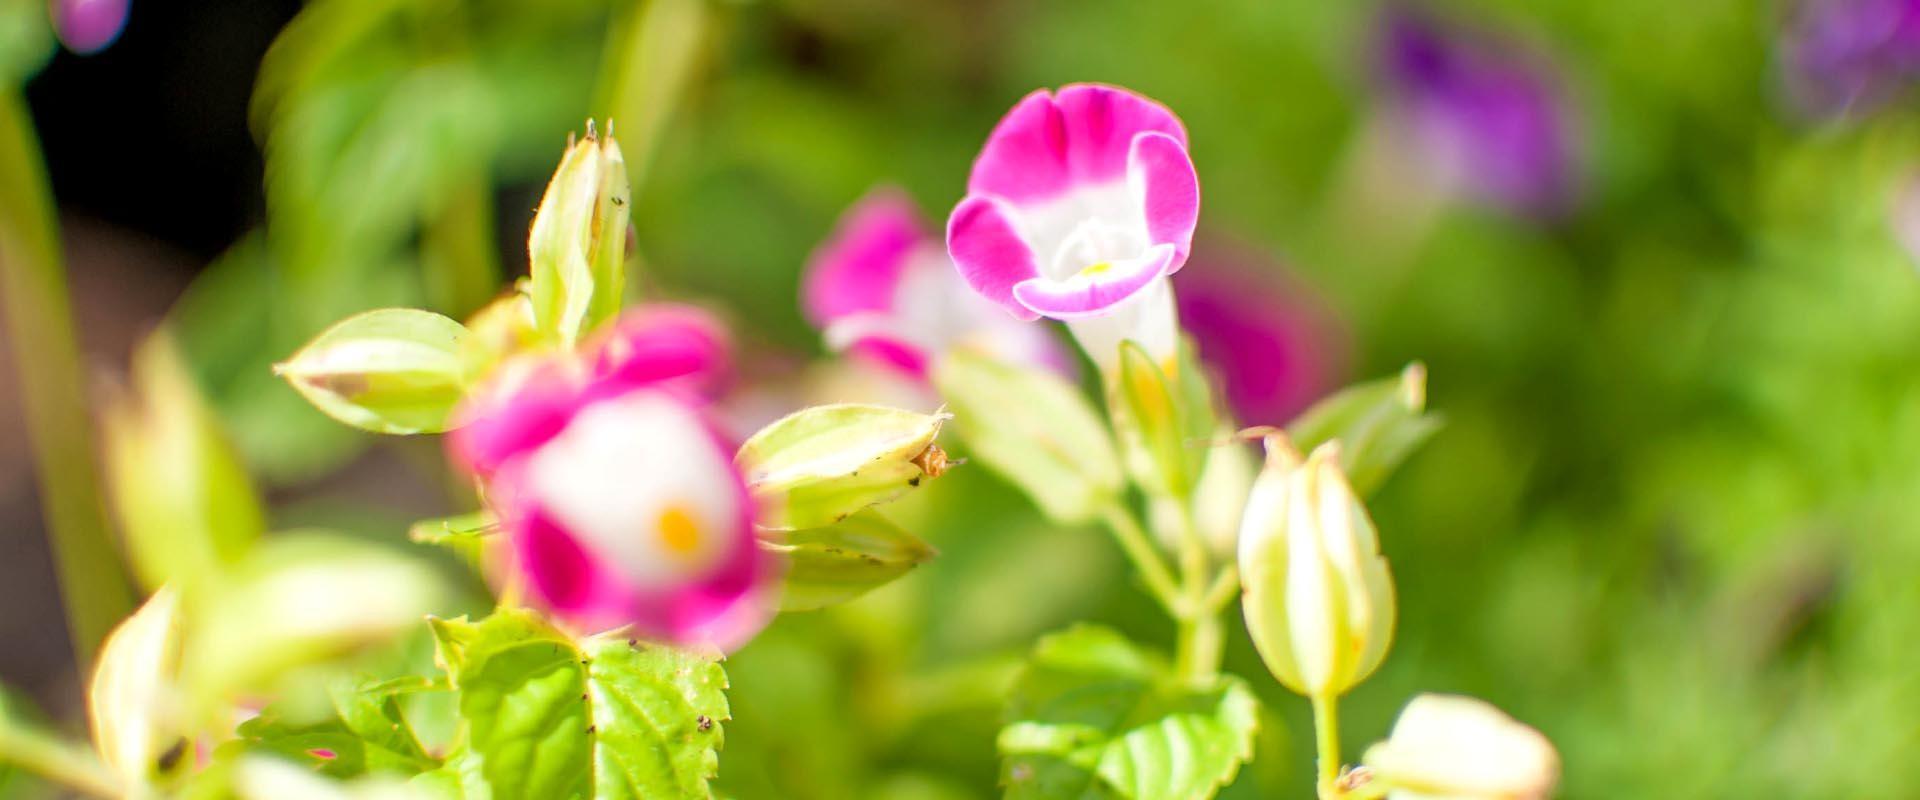 destaque flores